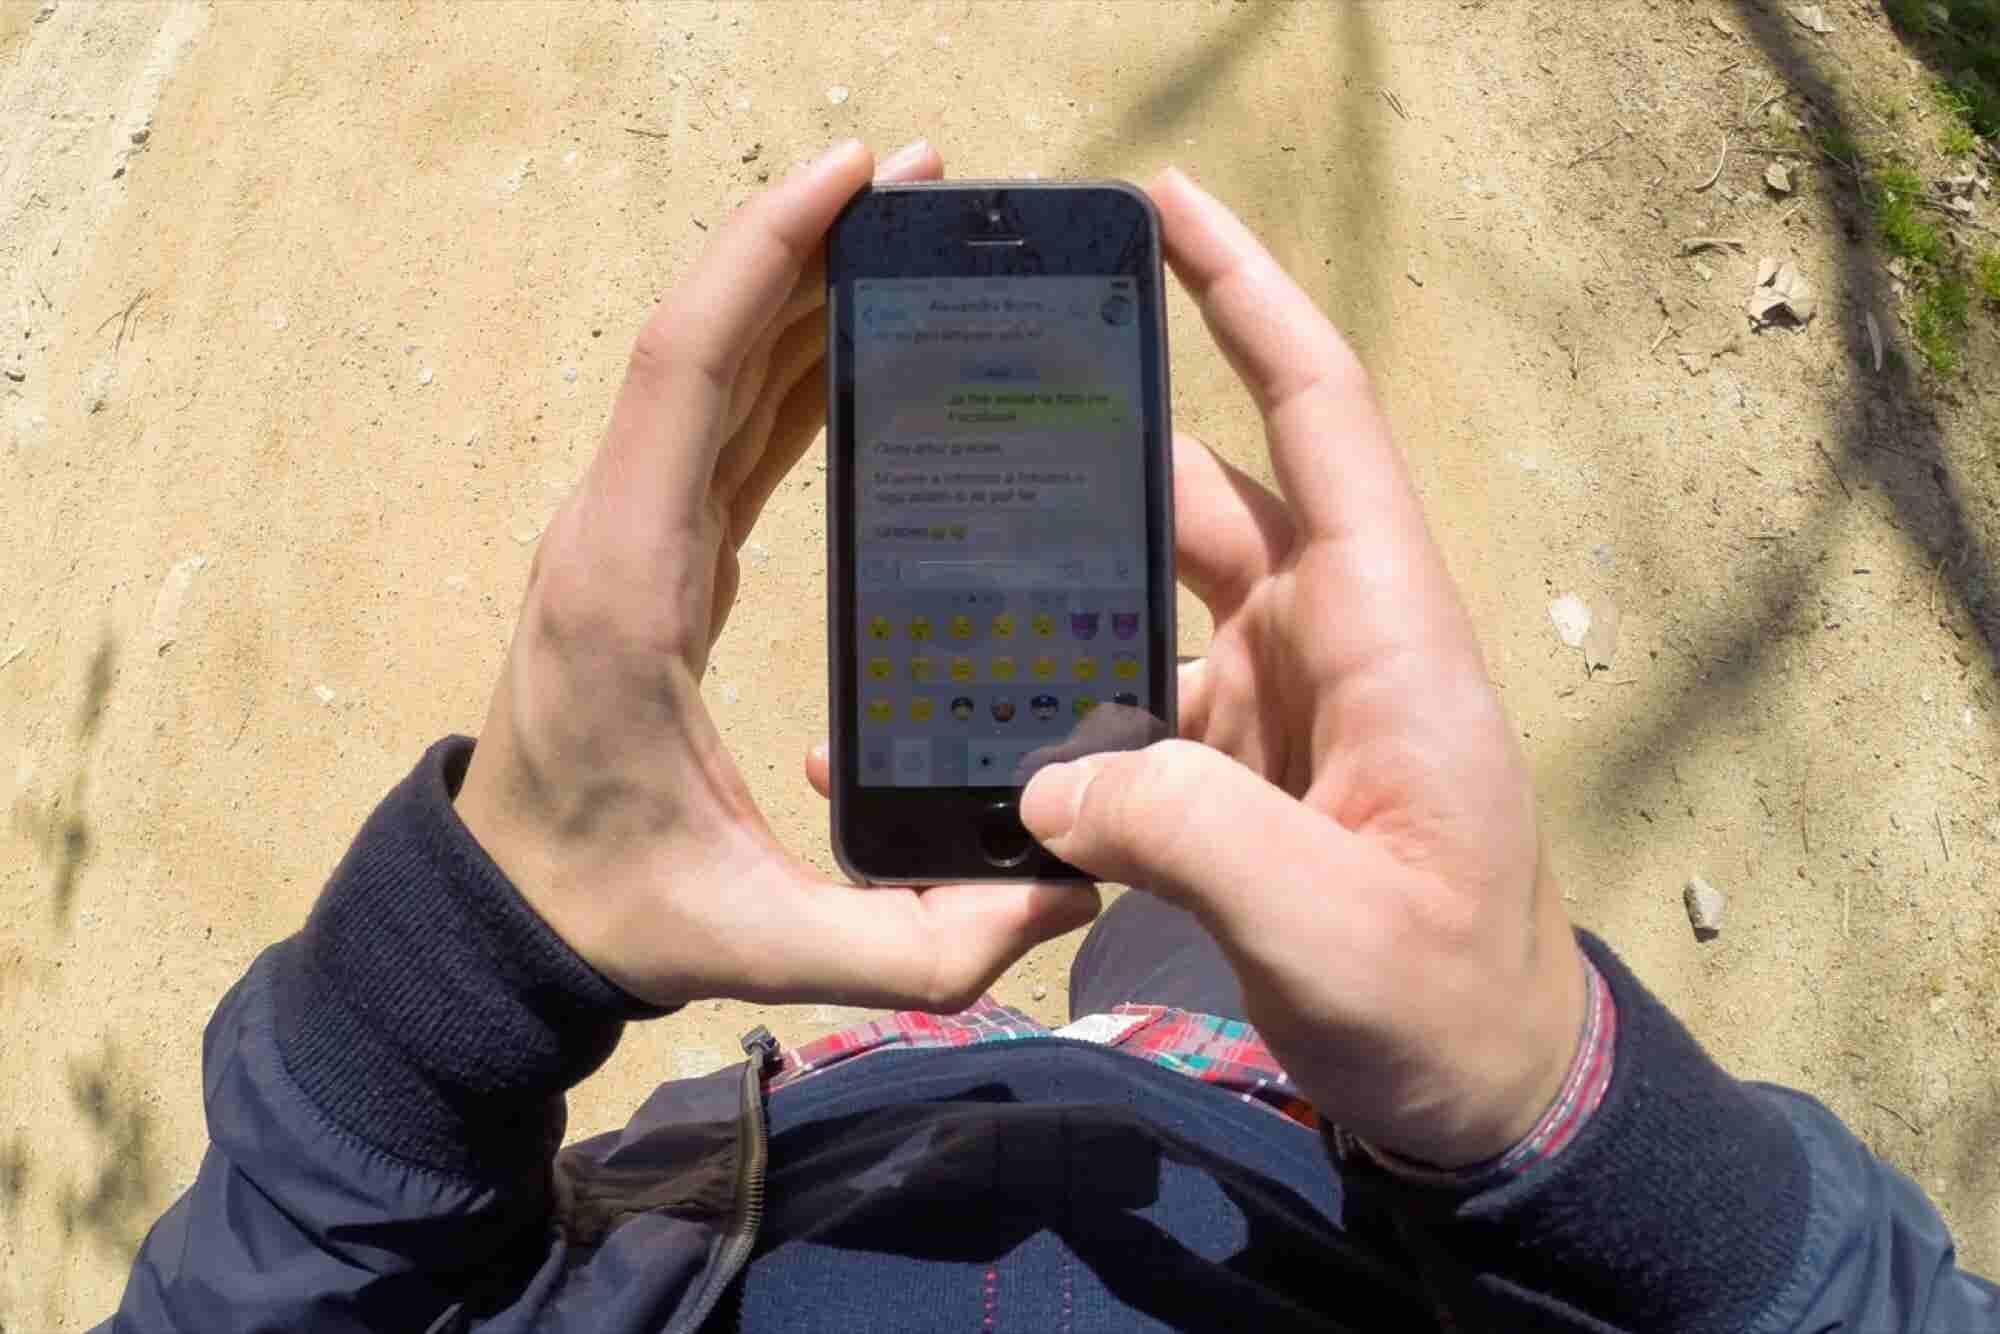 Apple Drops the Gun Emoji for a Friendlier Water Pistol